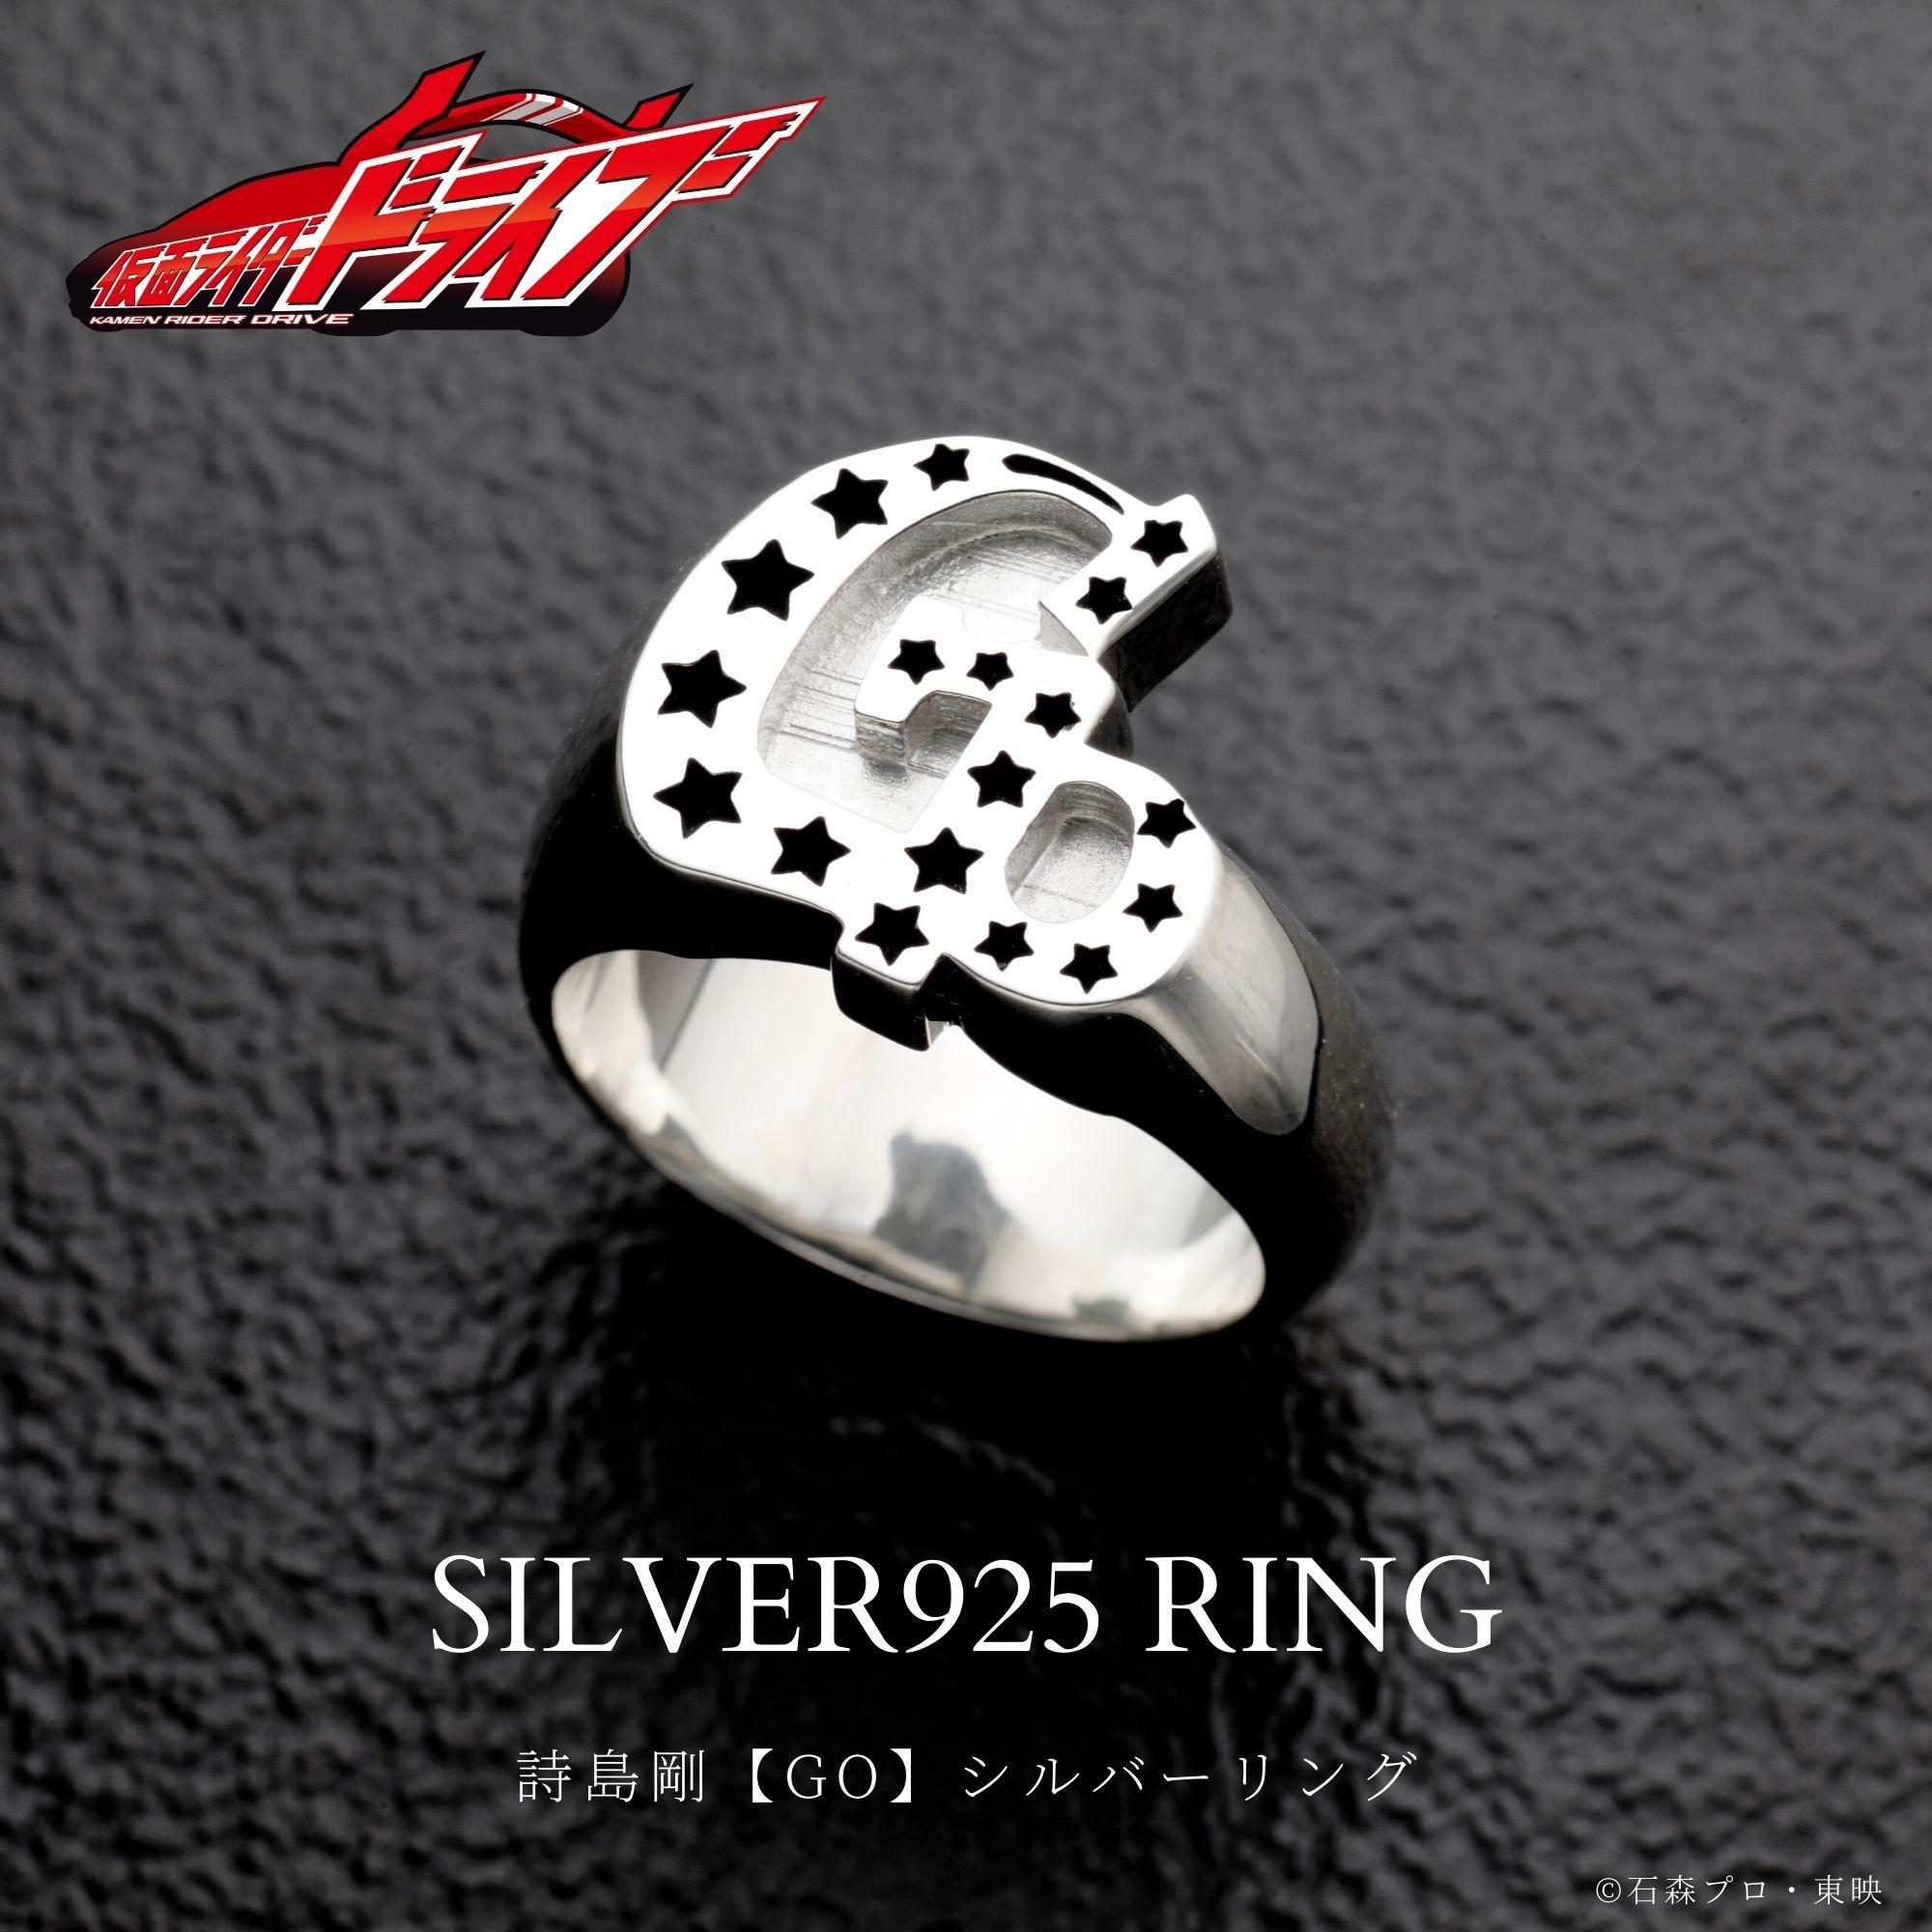 Go Shijima Ring—Kamen Rider Drive